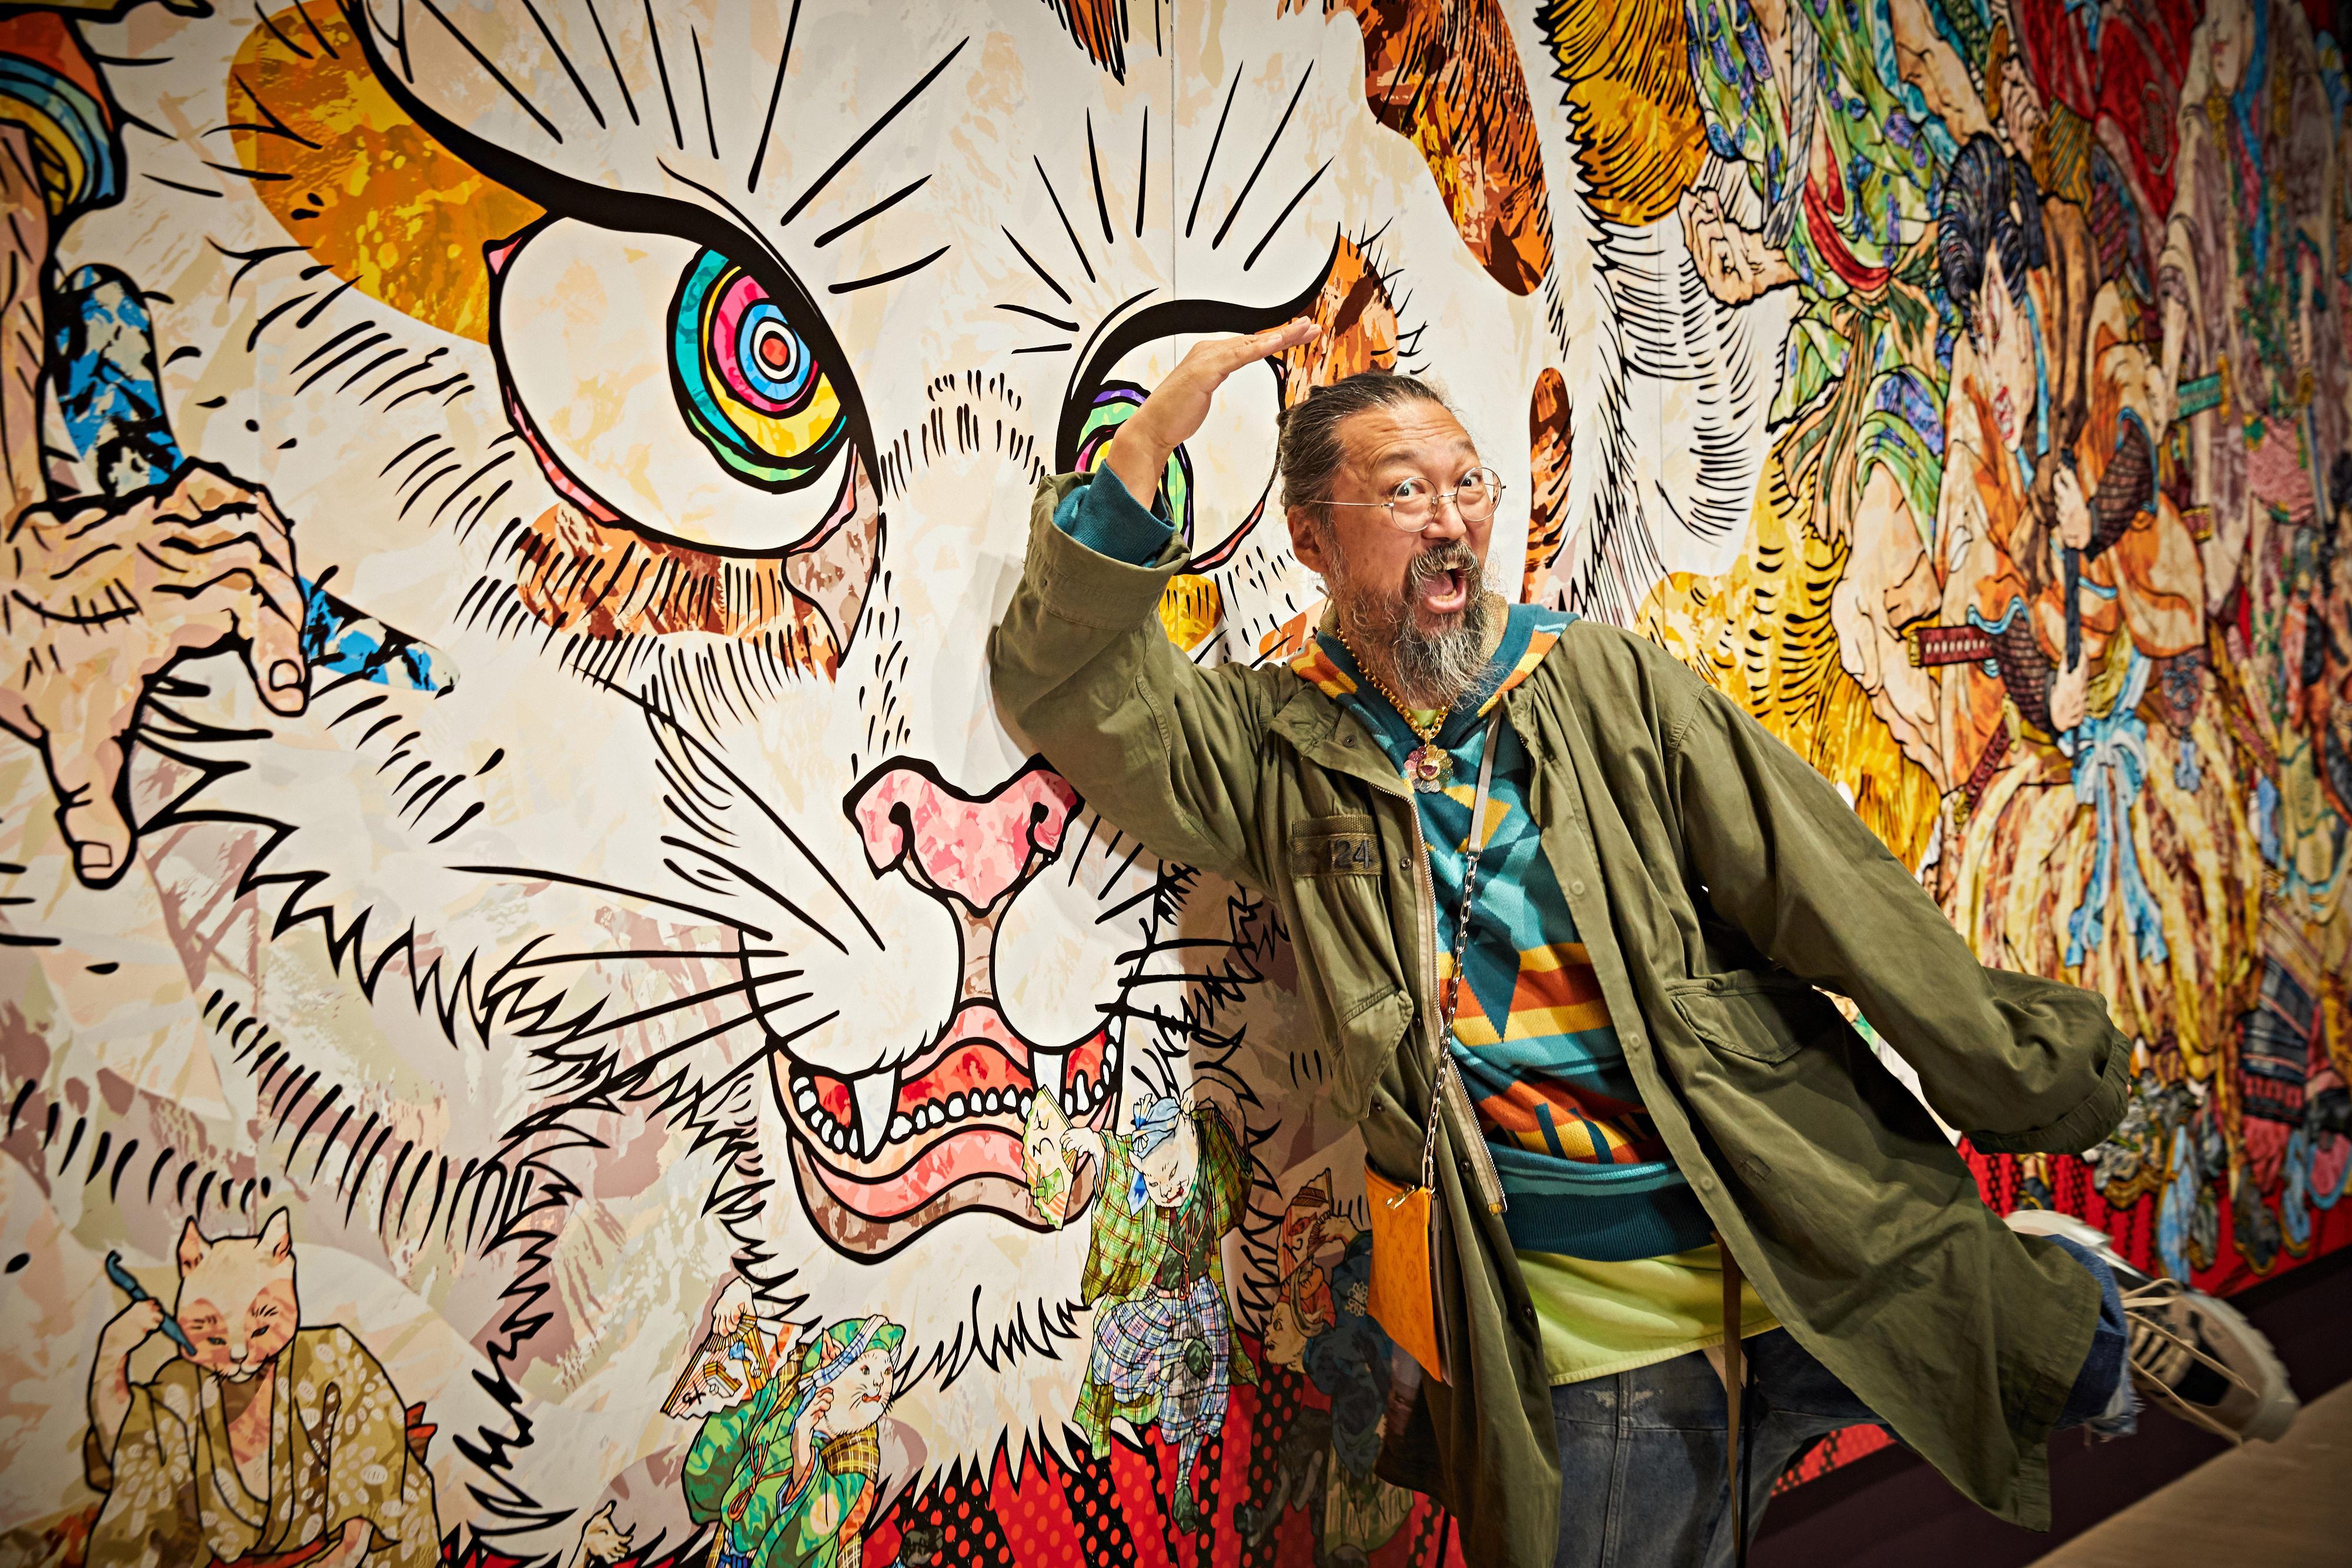 Takashi Murakami, Japan's rock star artist, unveils 10-metre 'stupid cat painting'